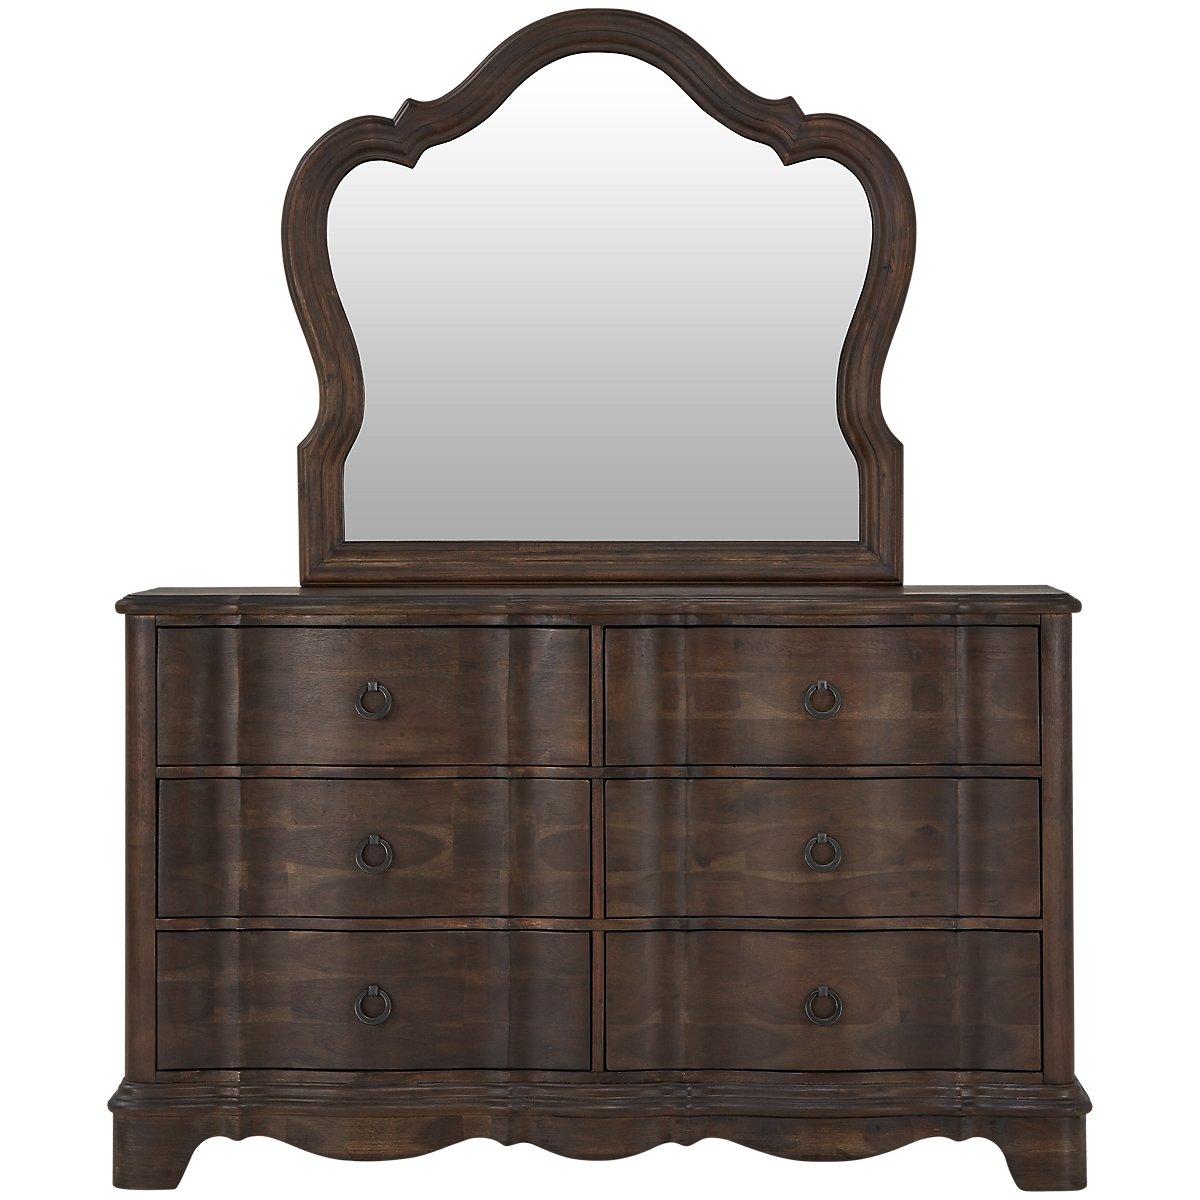 Parliament Light Tone Dresser & Mirror